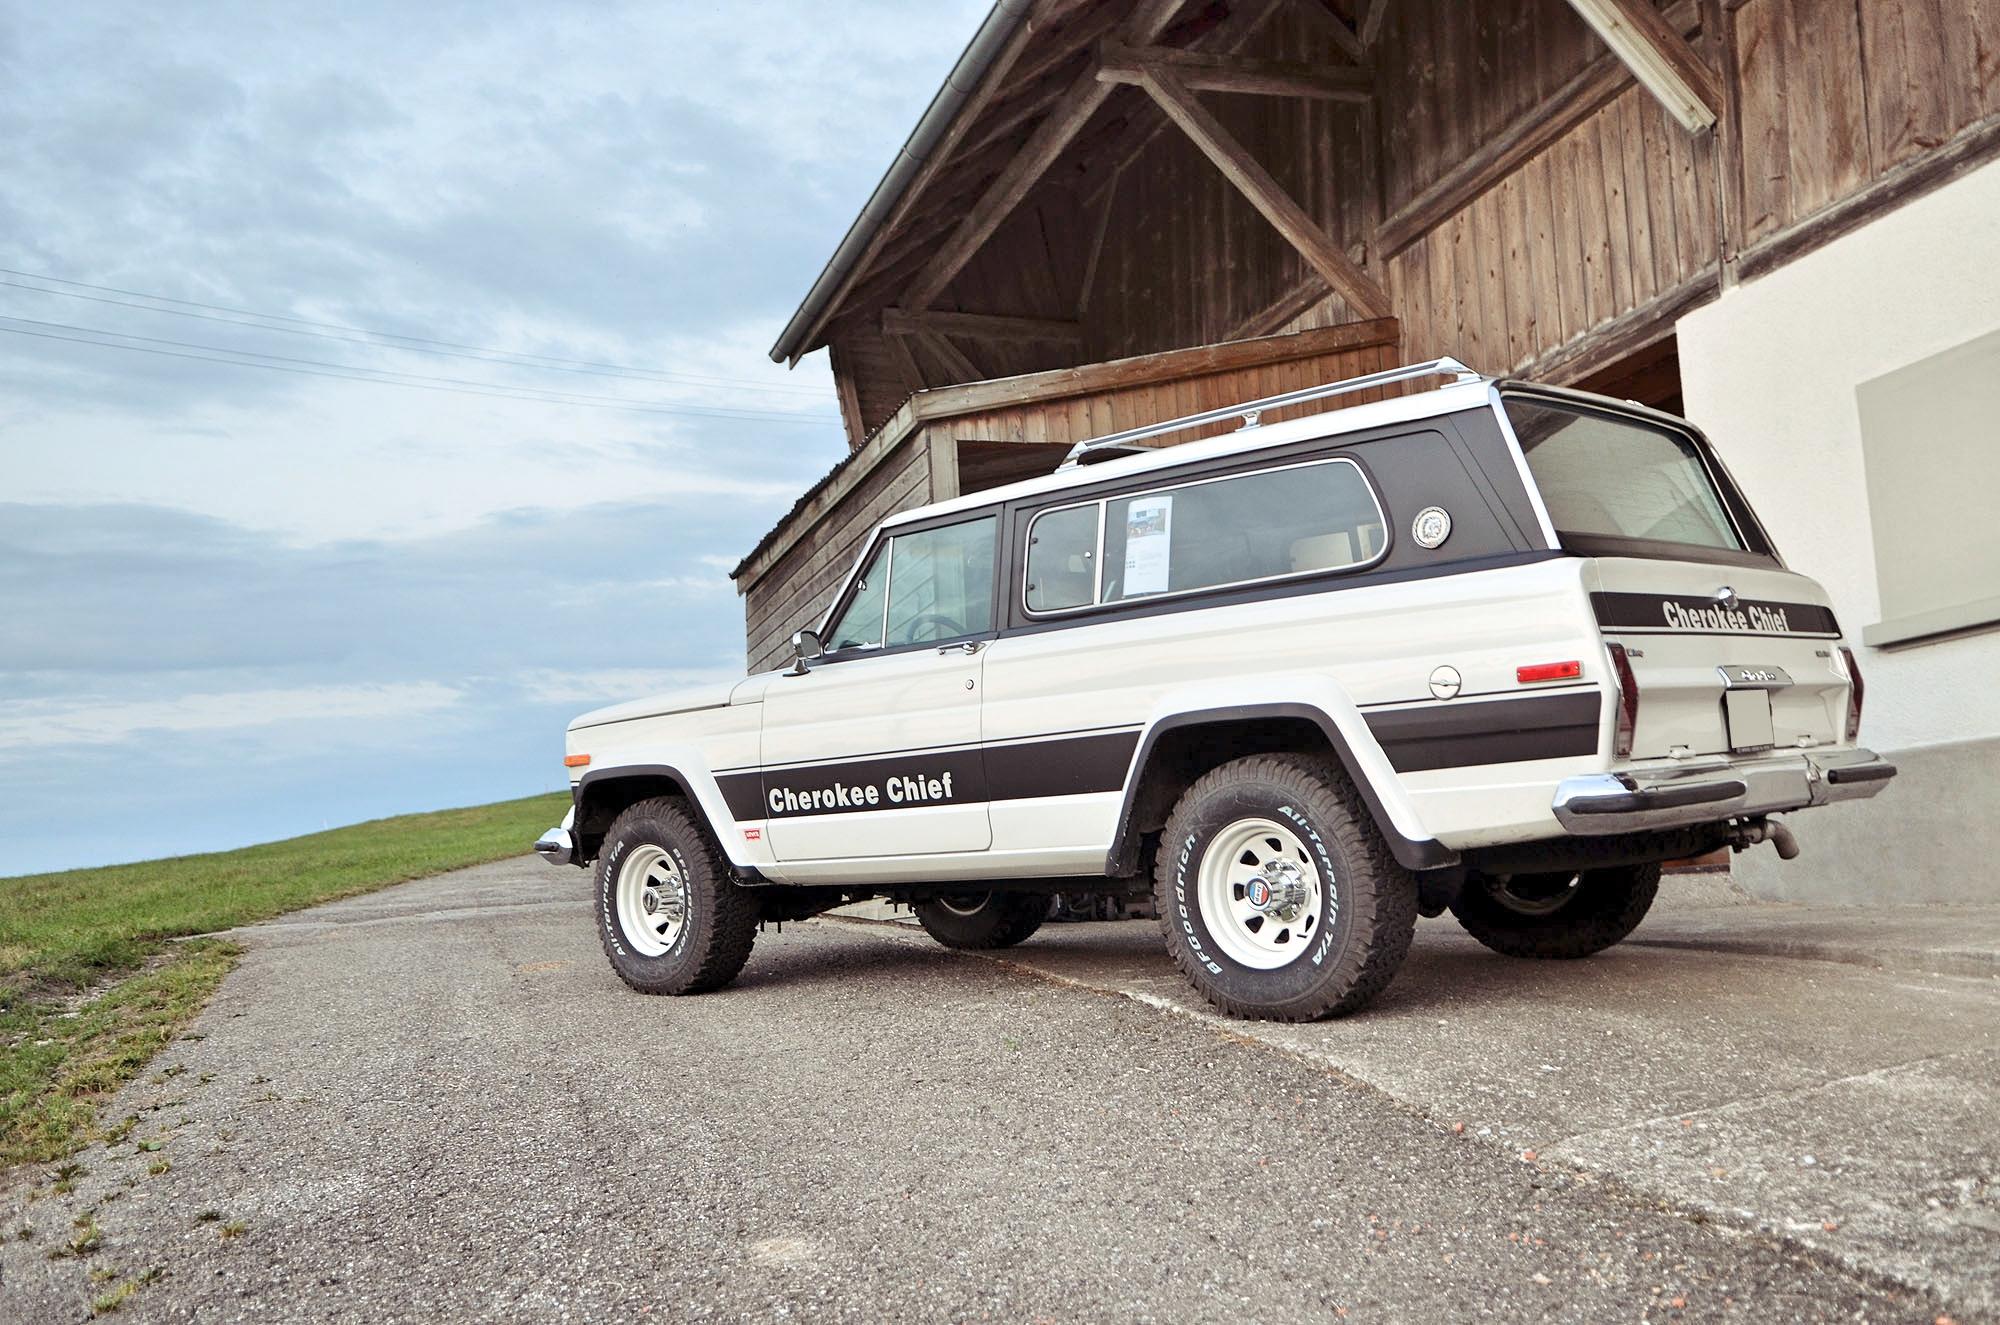 jeep-cherokee-chief-valloire-200.JPG